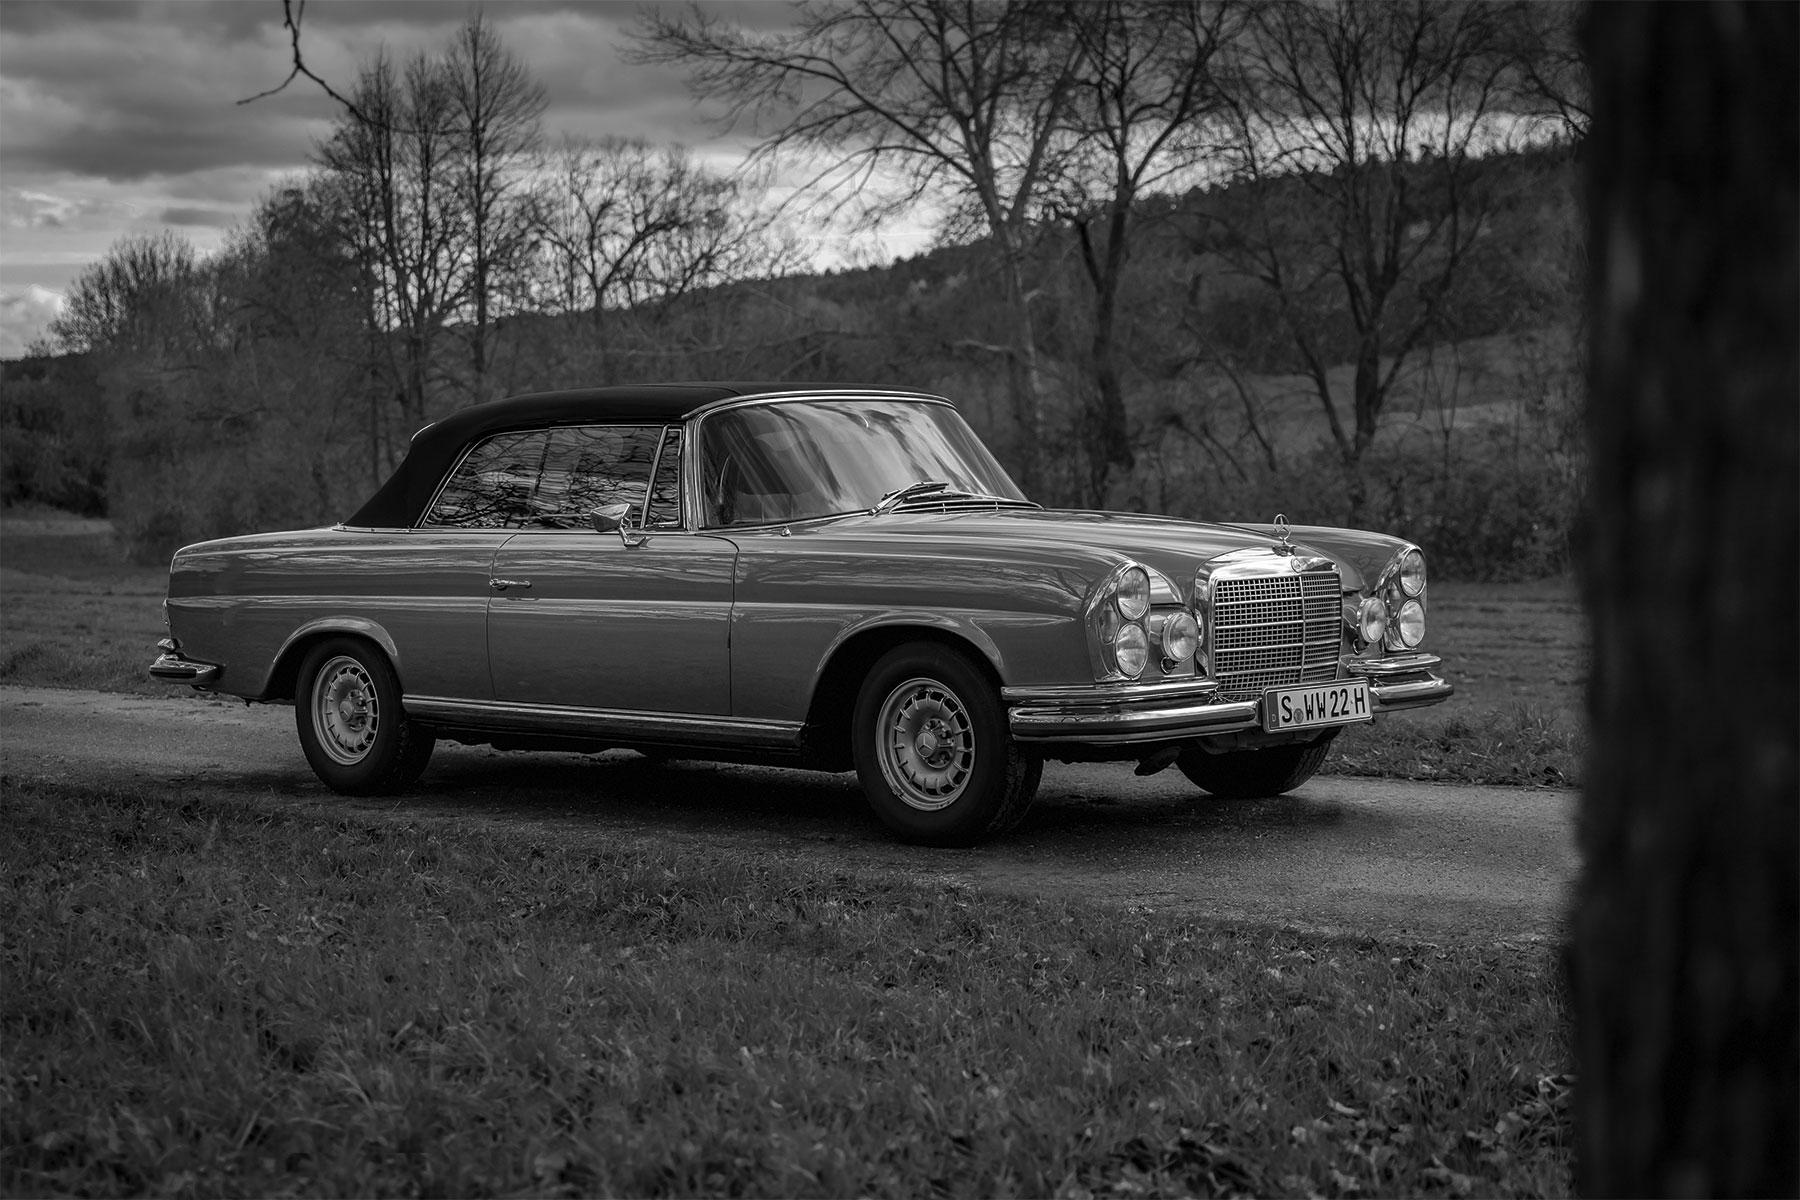 Mercedes Benz 280 SE Oldtimer Fotografie Automotive Stuttgart Basti Kaspar schwarzweiss